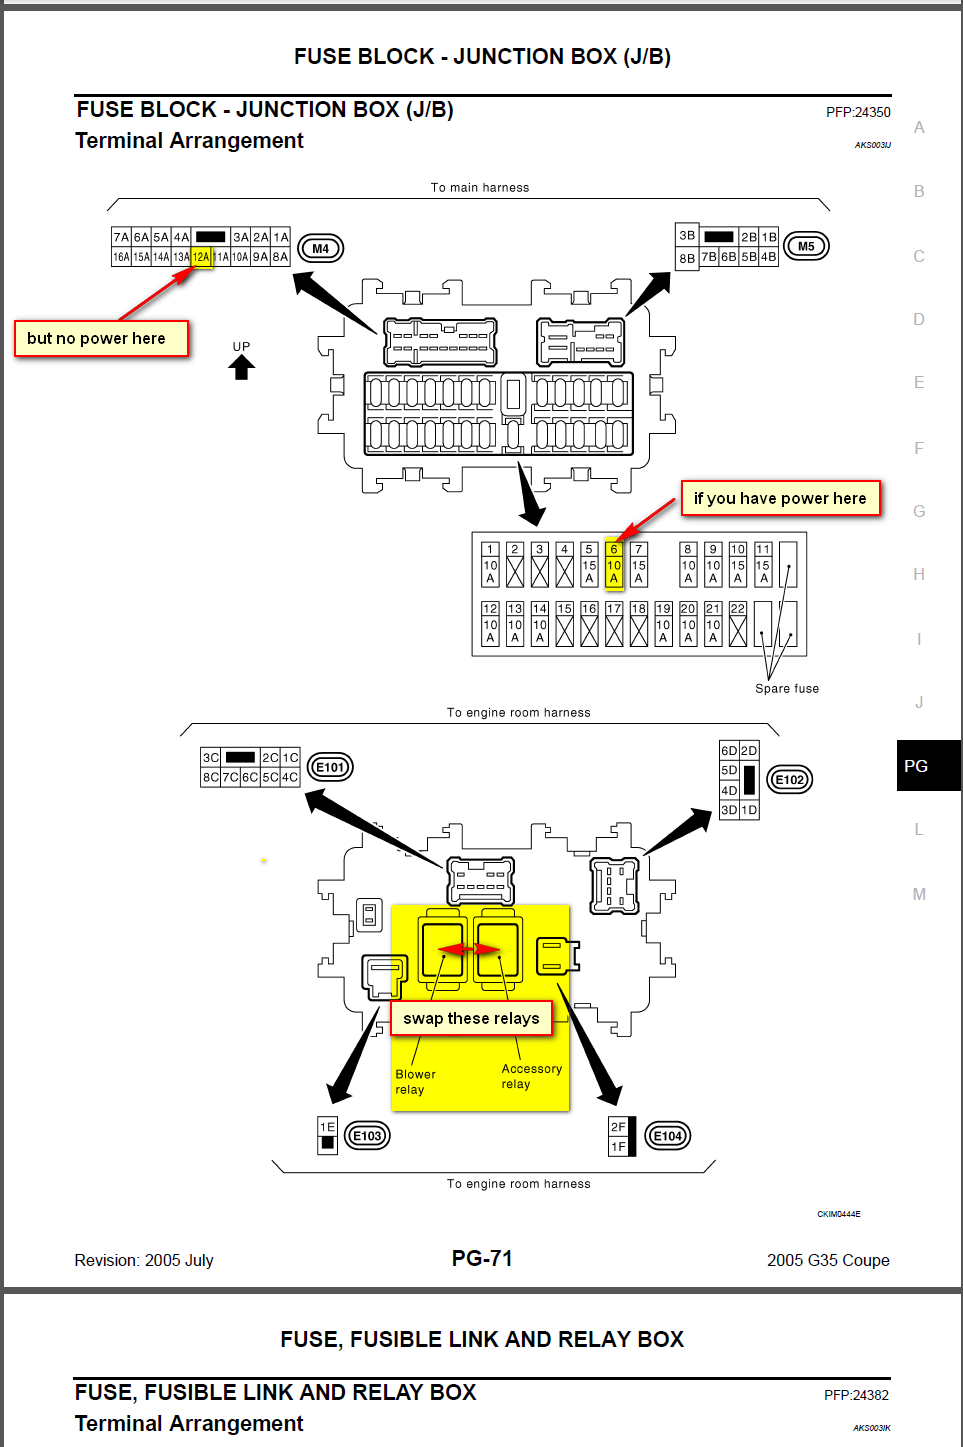 2005 G35 Fuse Box Diagram G Coupe Fuse Box Diagram on